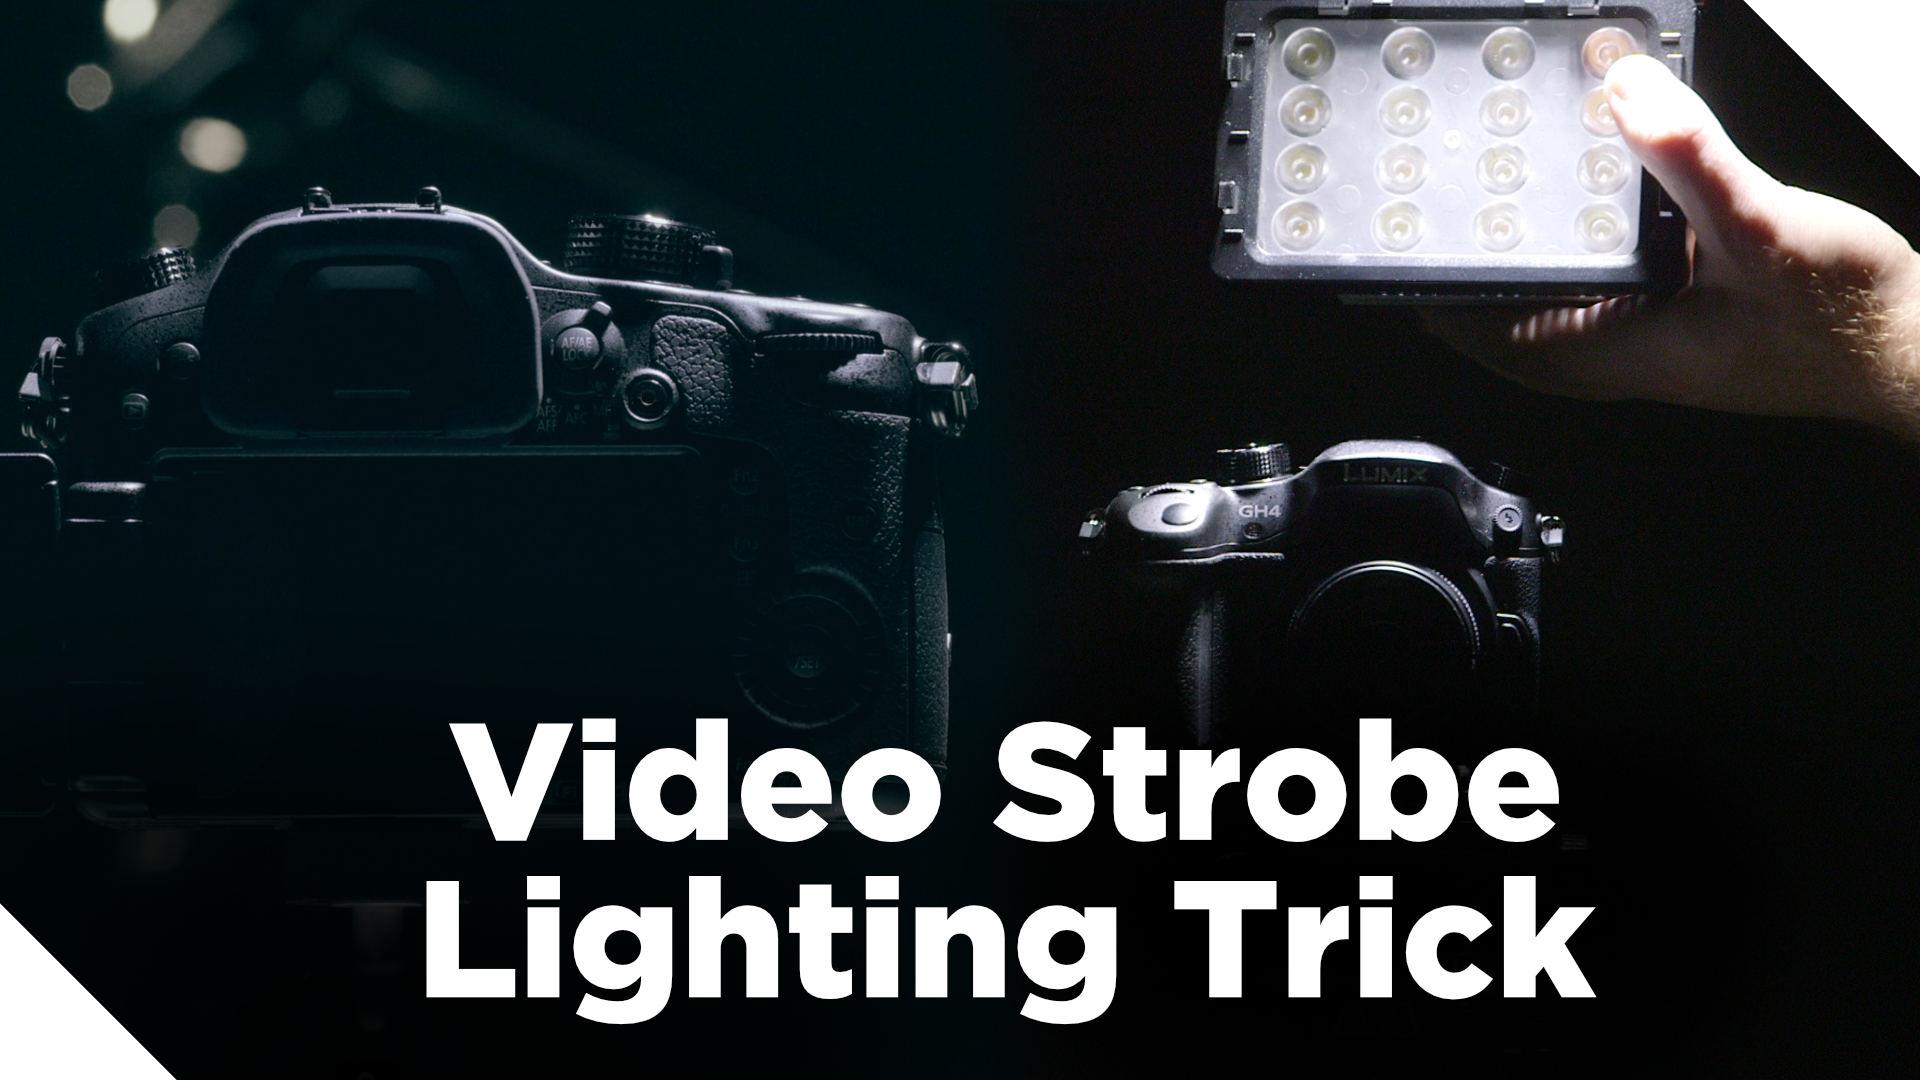 Sweet Video Strobe Lighting Trick